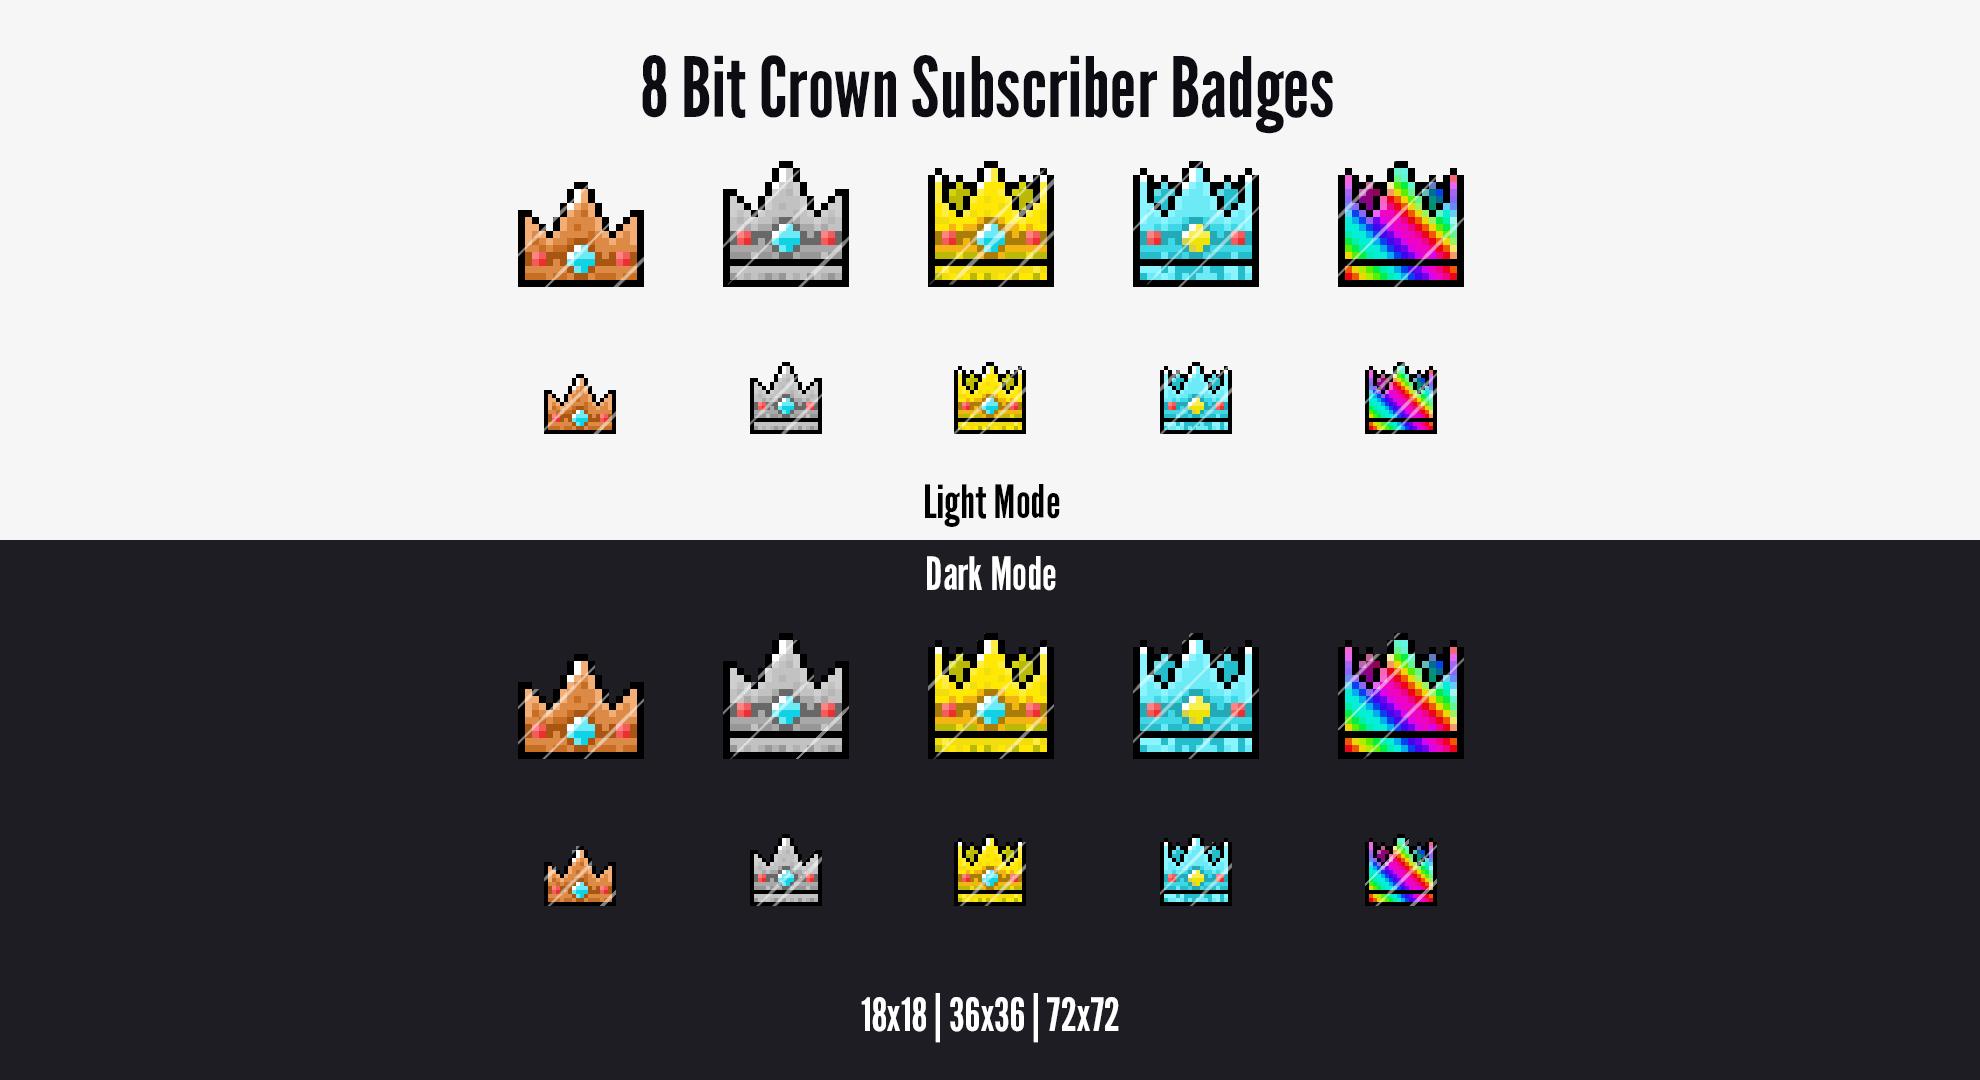 Twitch Subscriber Bit Loyalty Badges 8 Bit Pixel Crown Text Emotes Badge Twitch